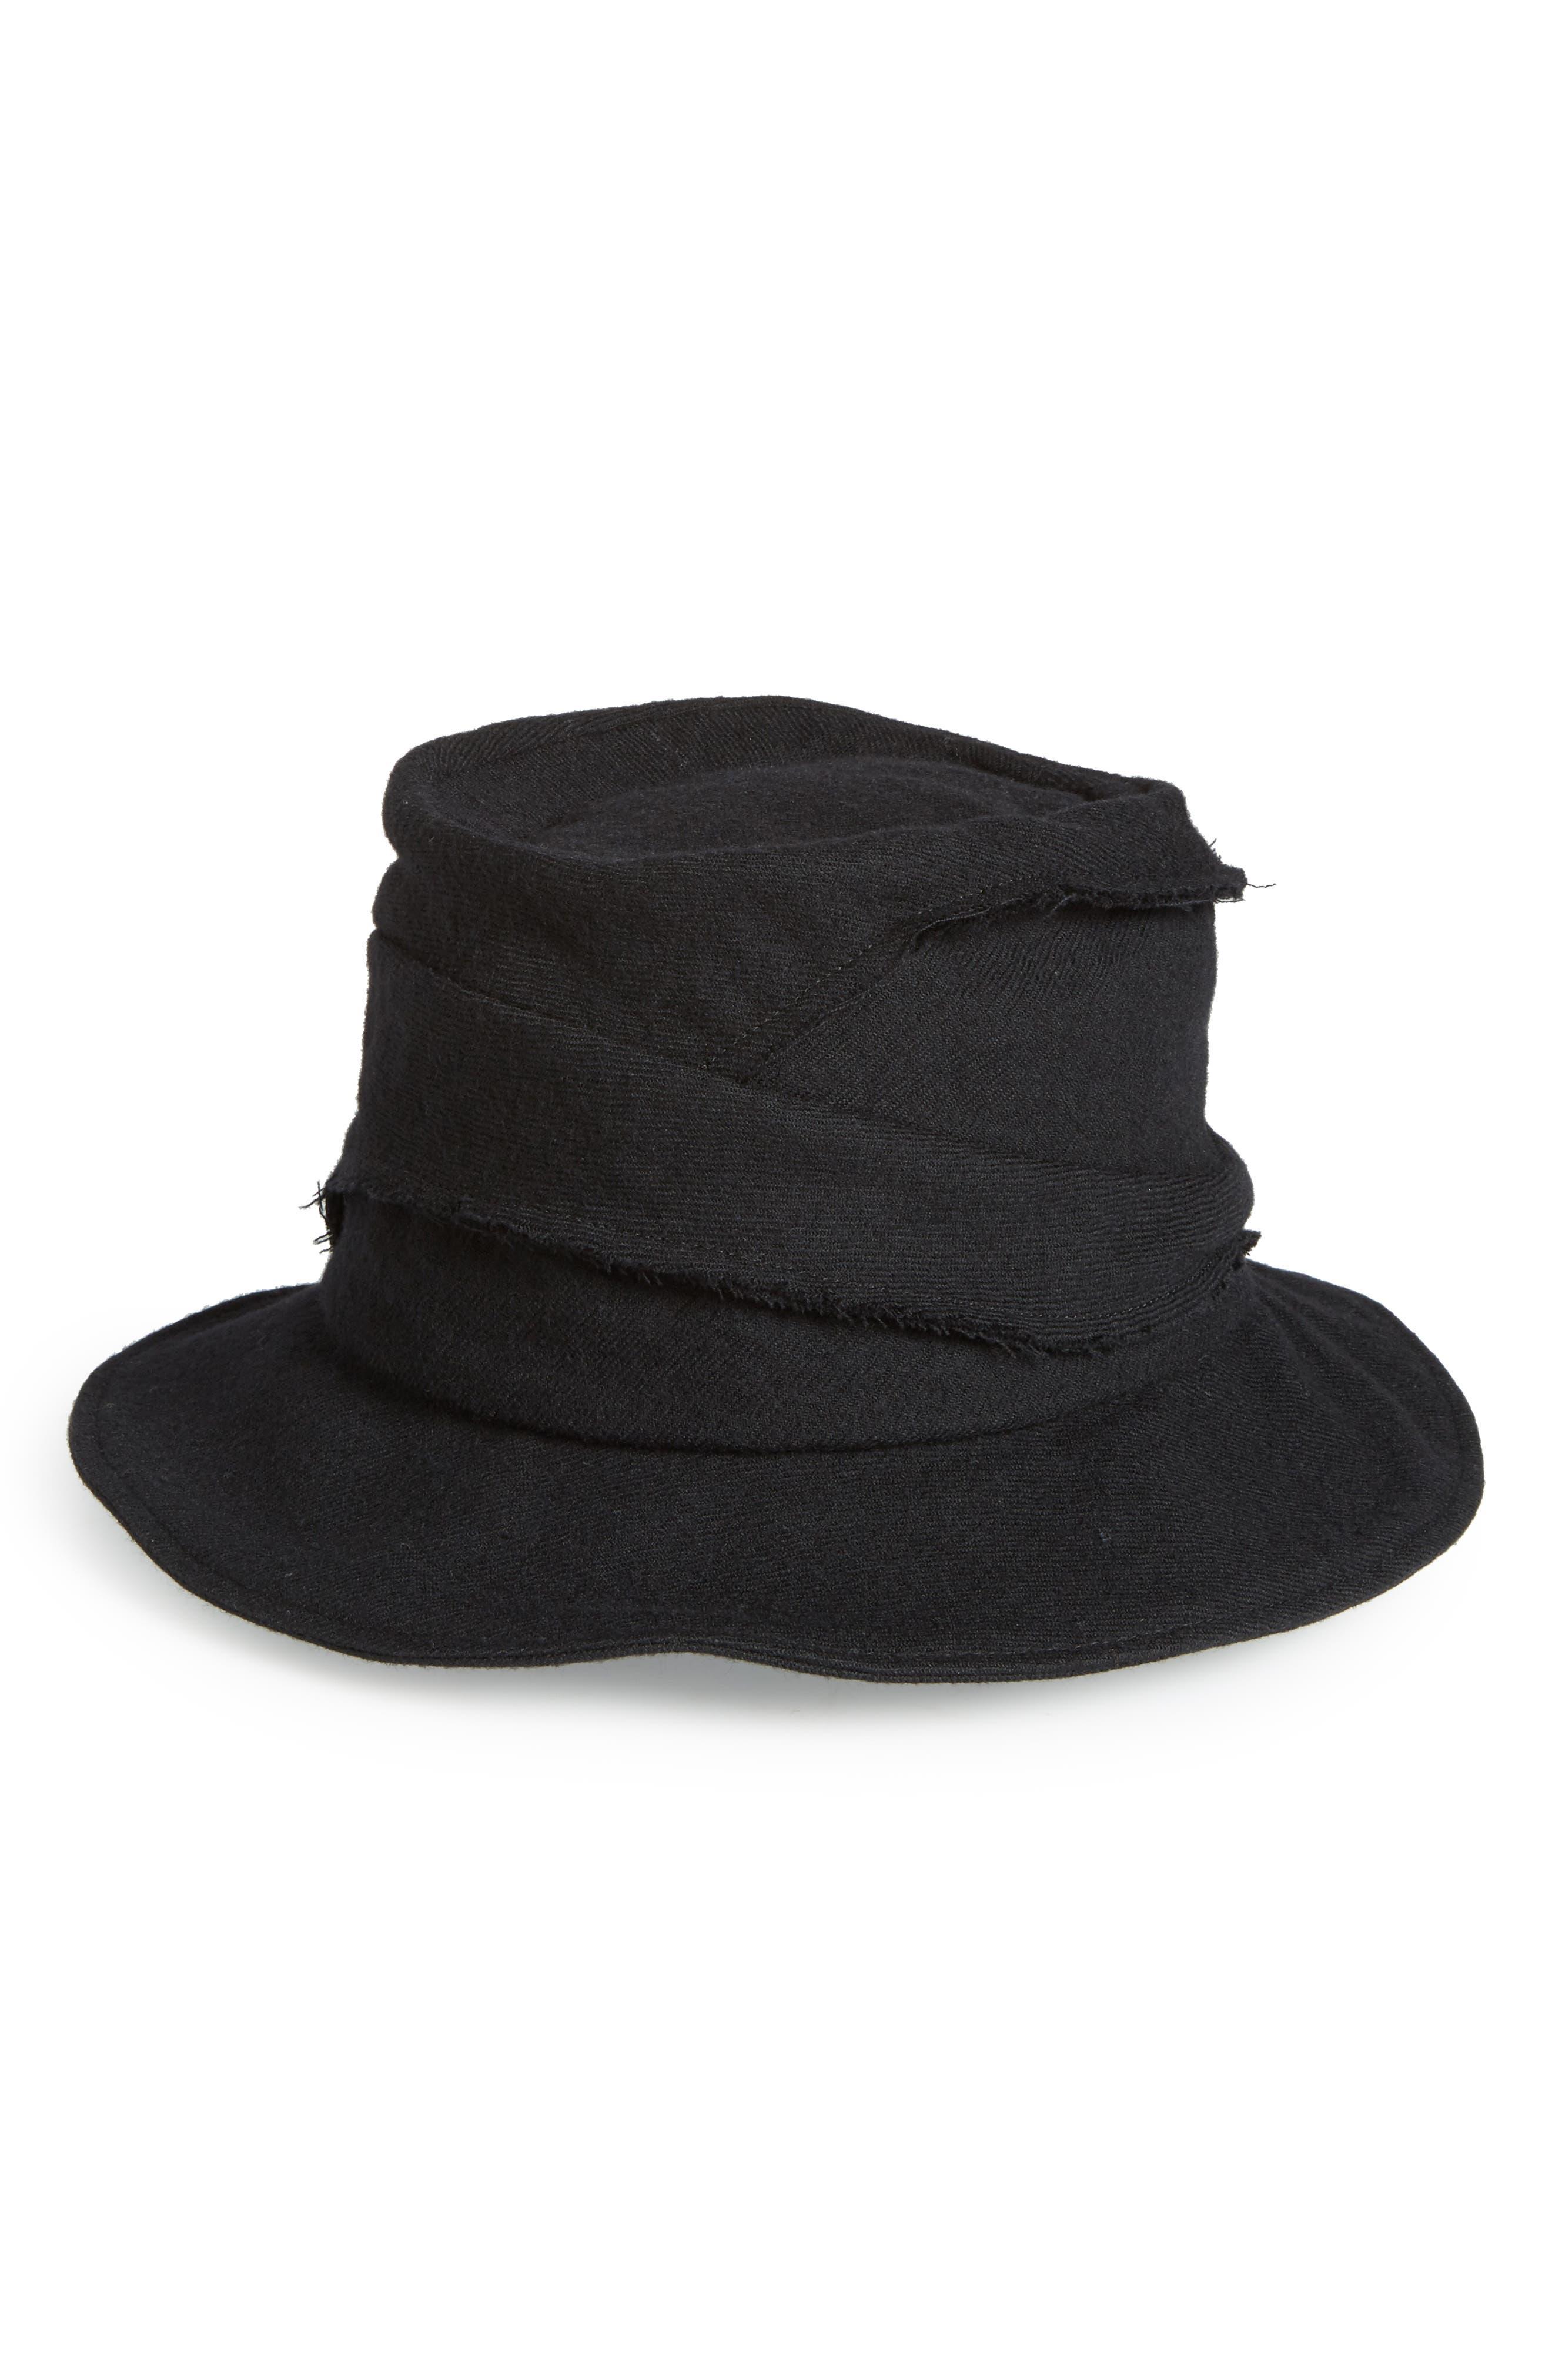 Alternate Image 1 Selected - Y's by Yohji Yamamoto Layered Wool Hat